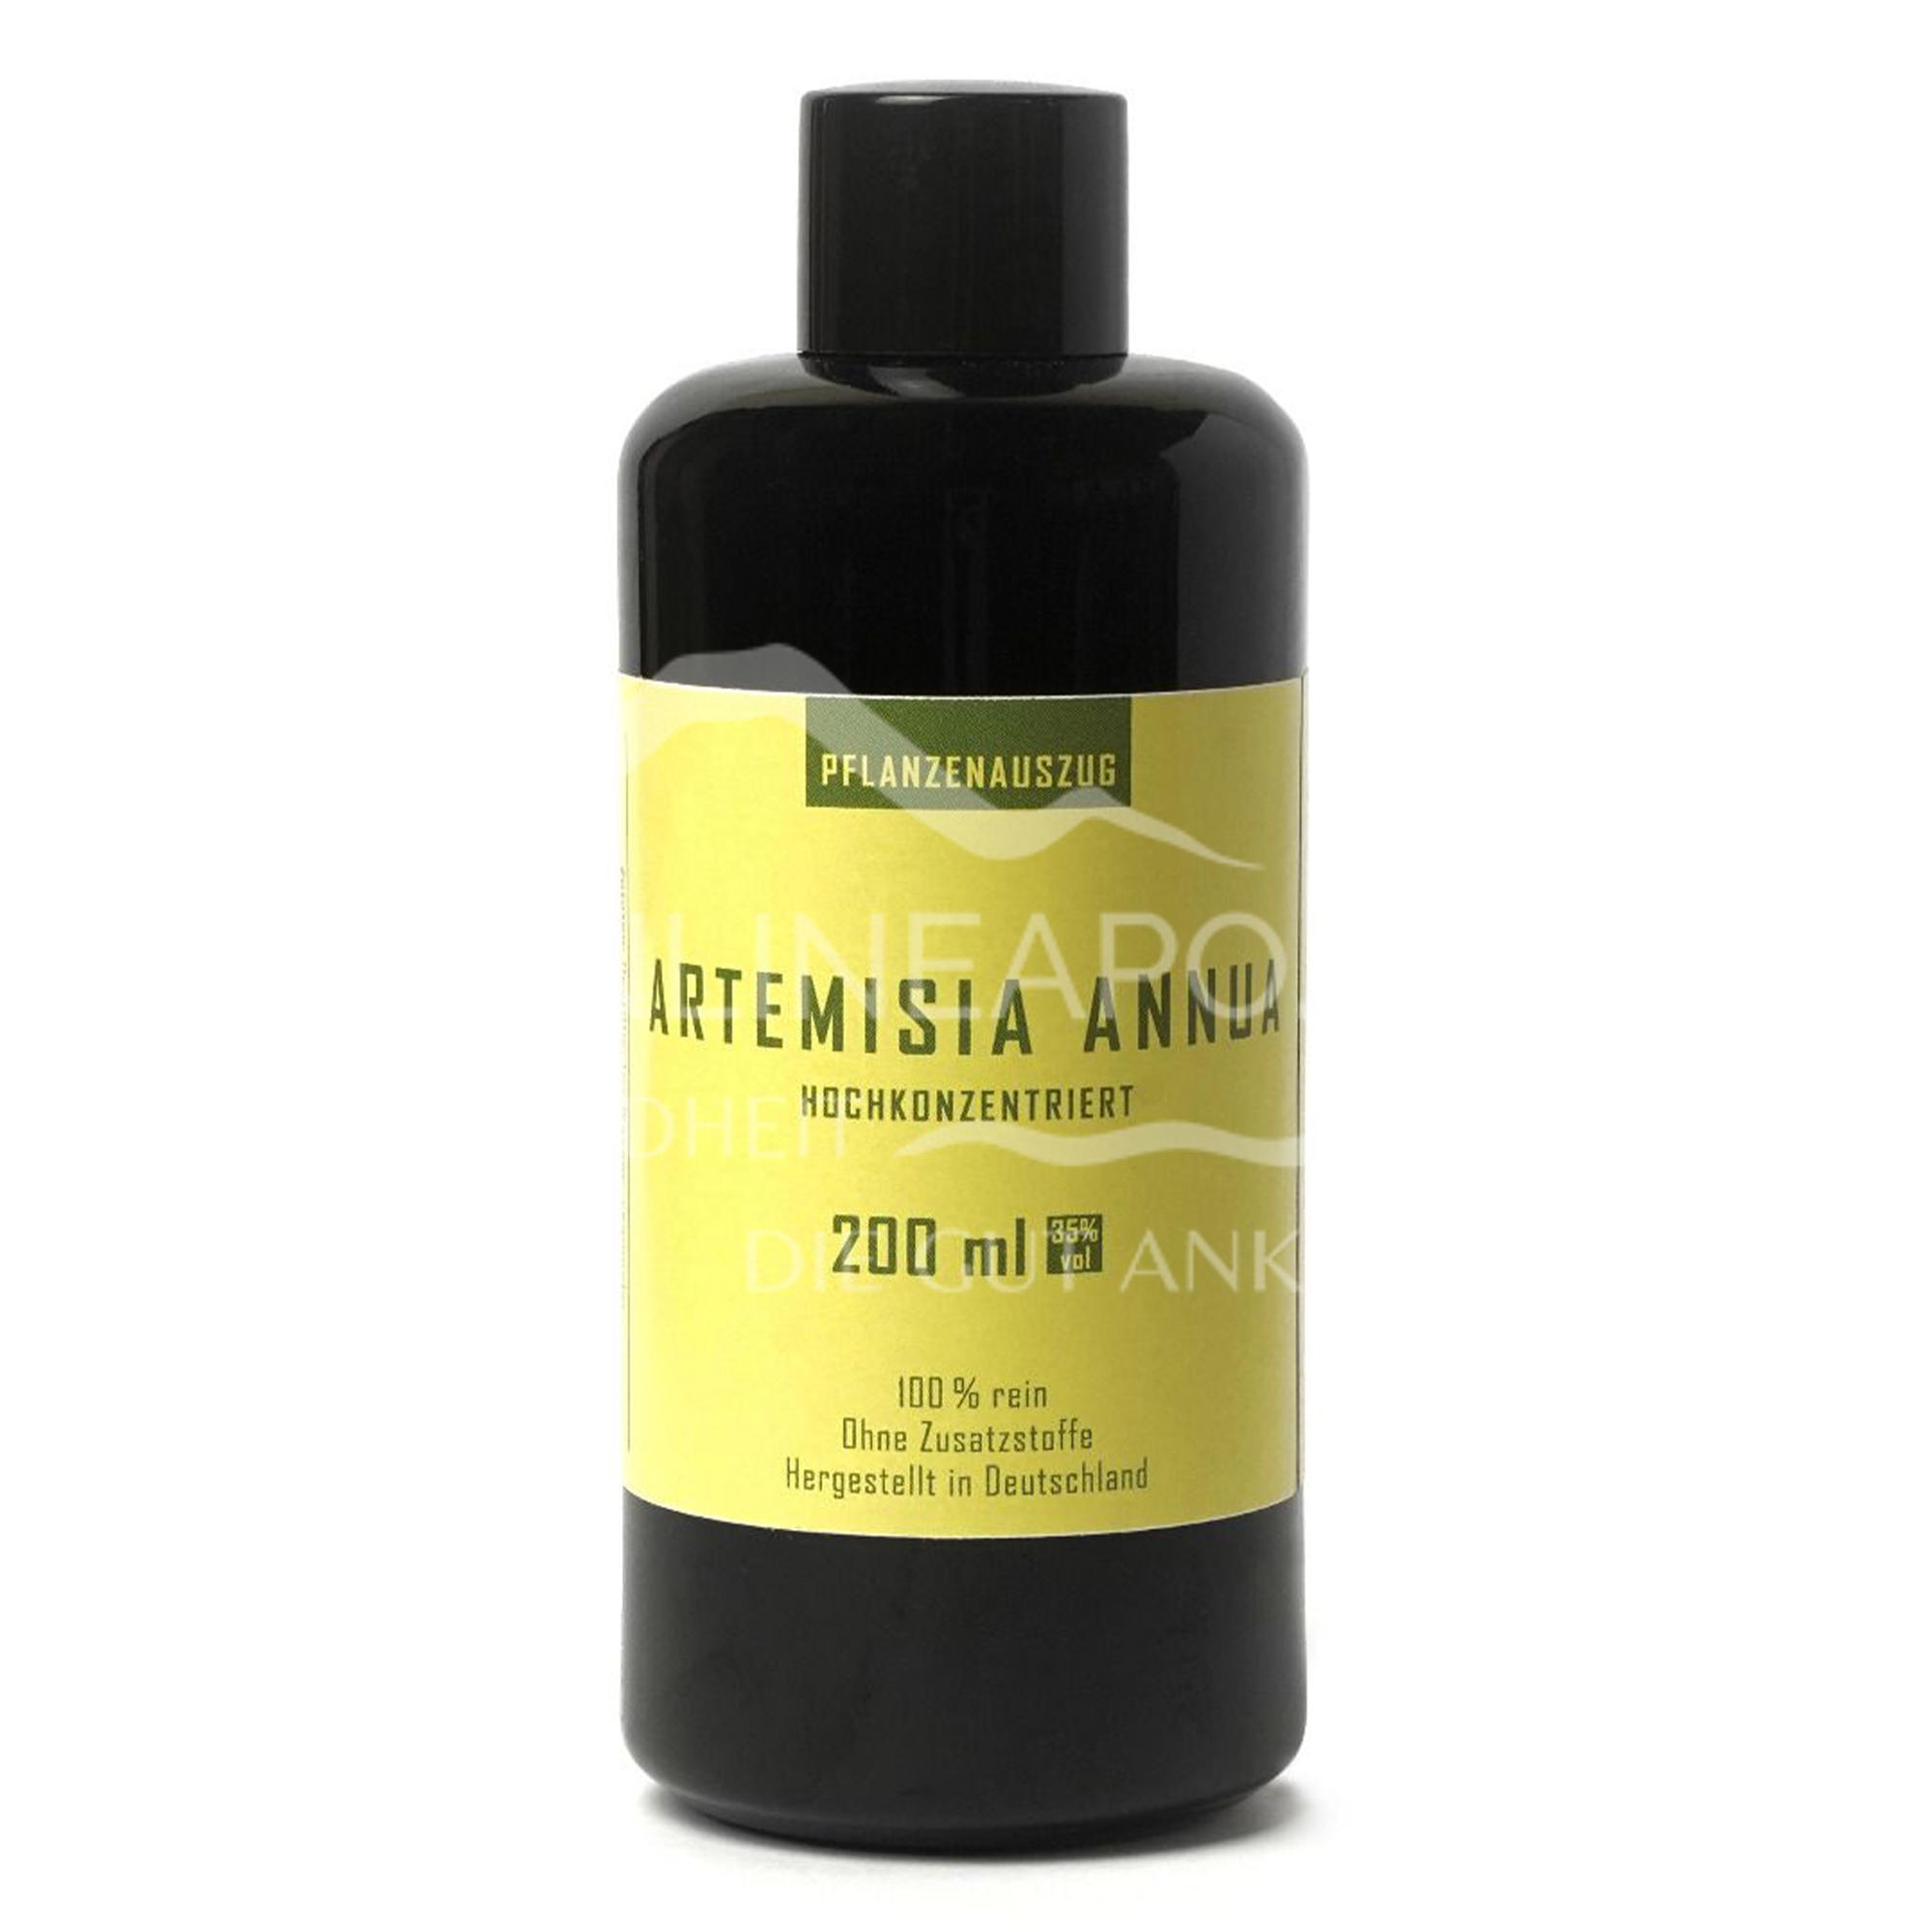 Kasimir und Lieselotte Artemisia Annua Pflanzenauszug